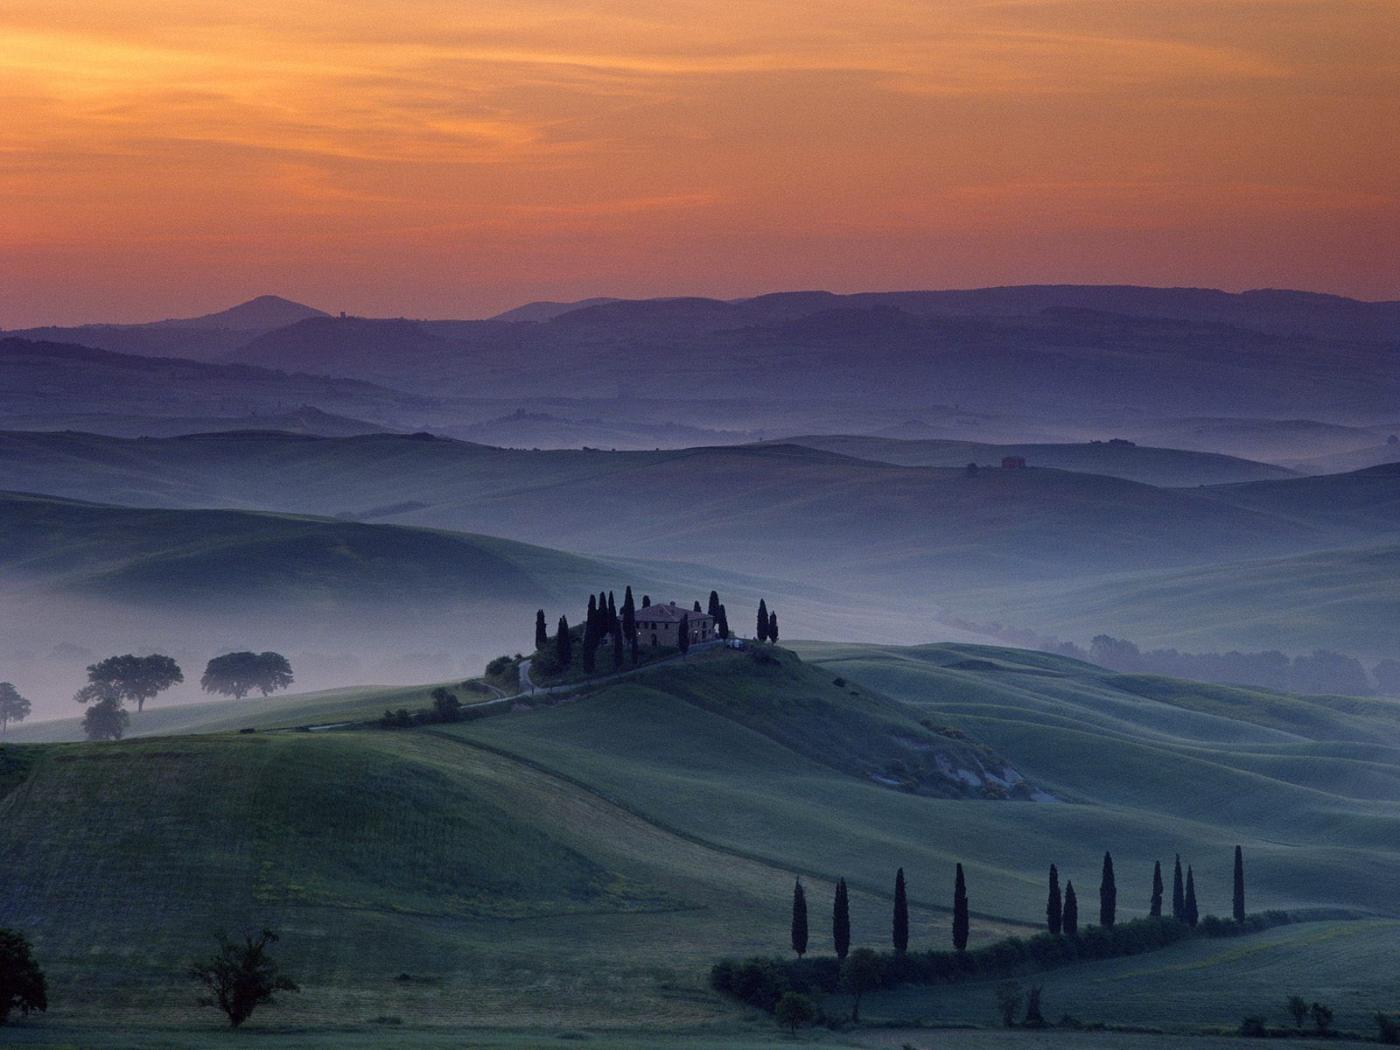 belvedere_tuscany_italy.jpg